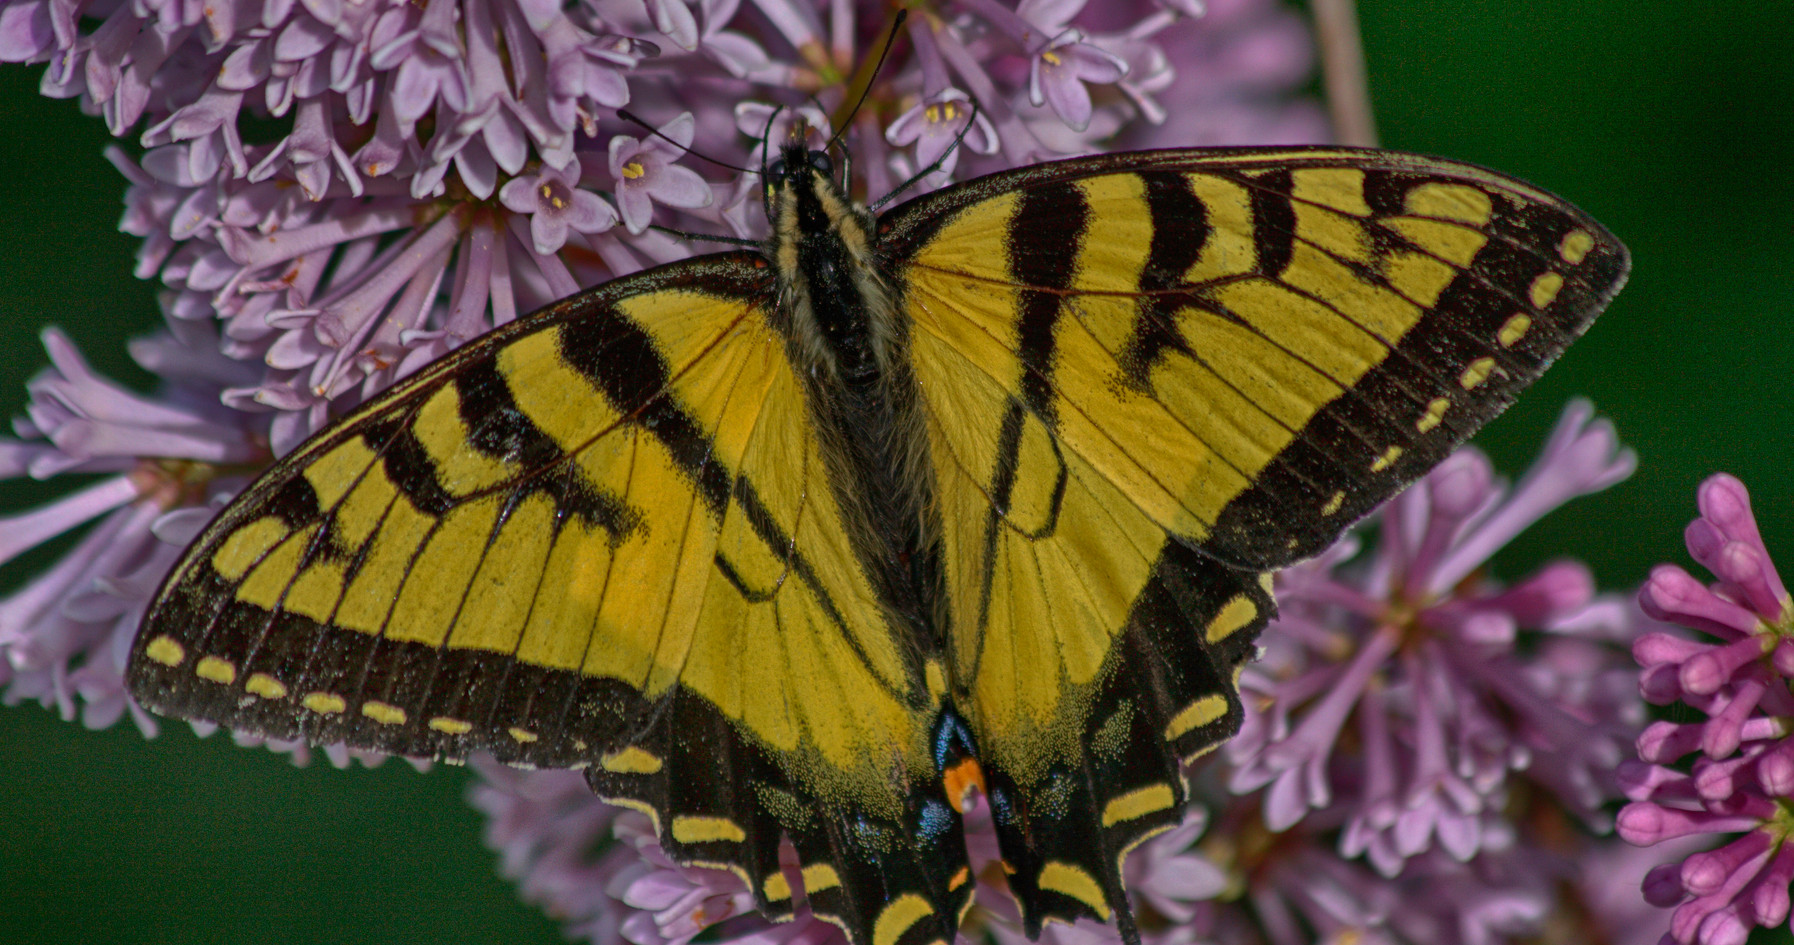 2009_06_17_1584 Tiger Swallowtail CrLe_HDR.jpgA Swallowtail